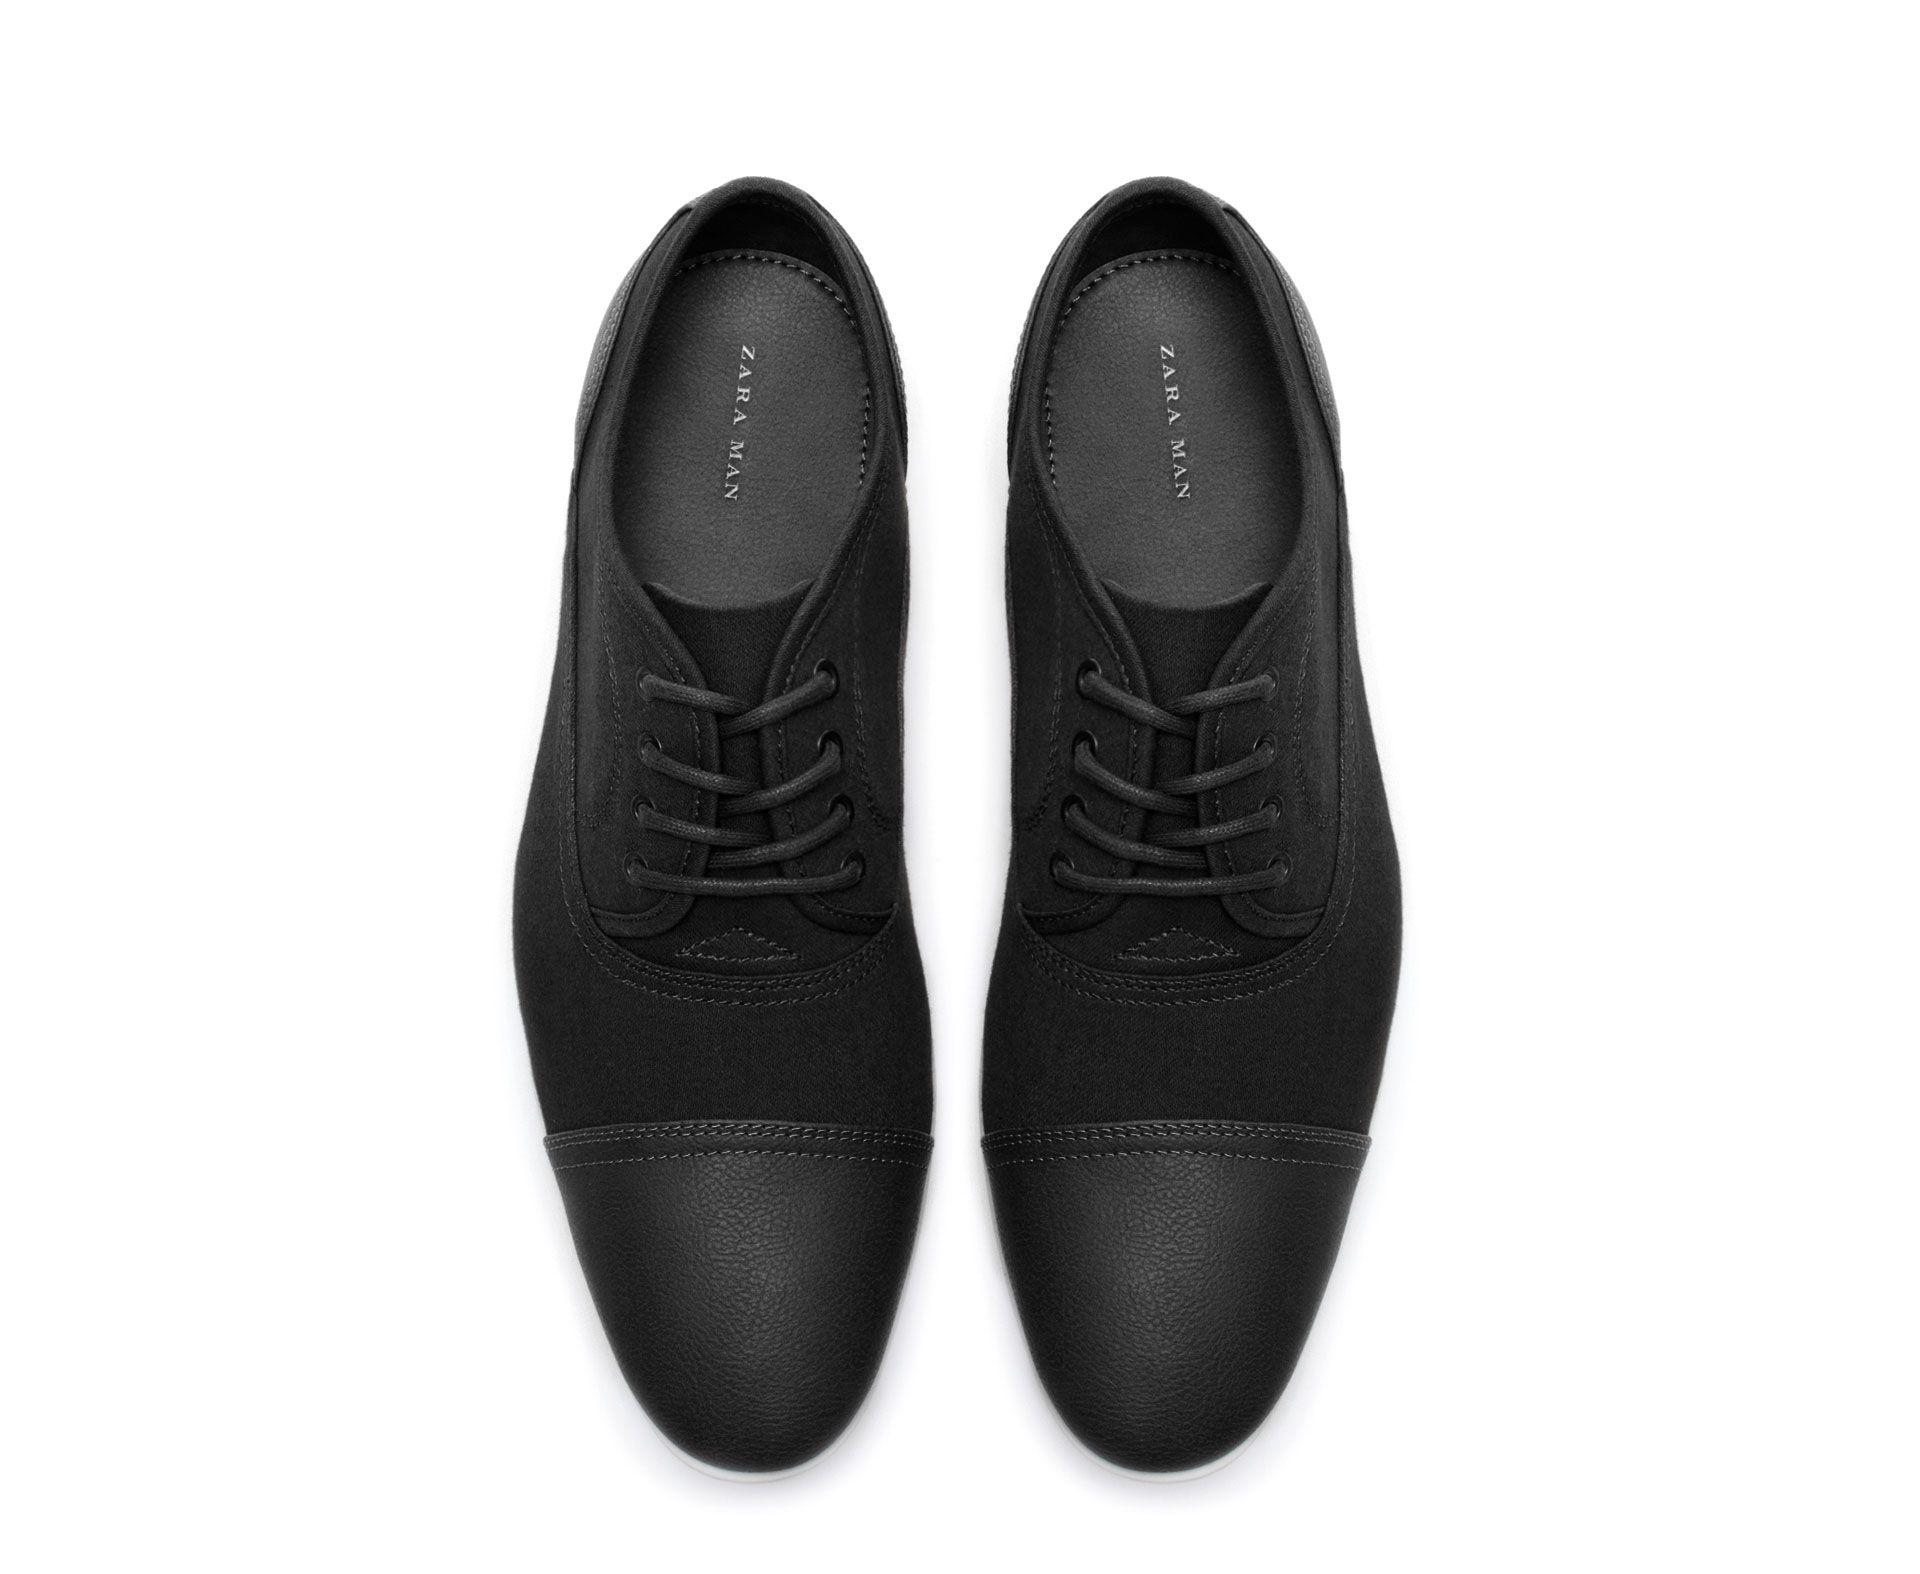 Honduras Sport Slim Style Men HombreZara Combinado Zapatos mvfbyI76Yg